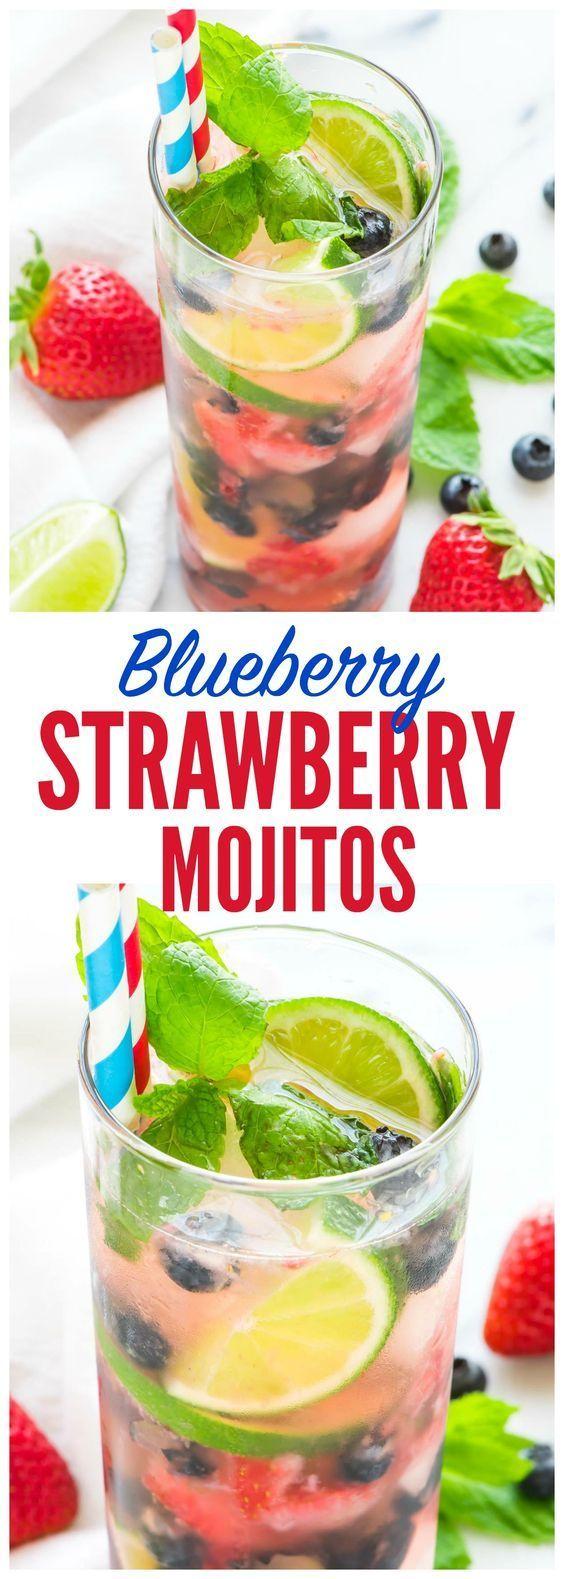 Blueberry Strawberry Mojito